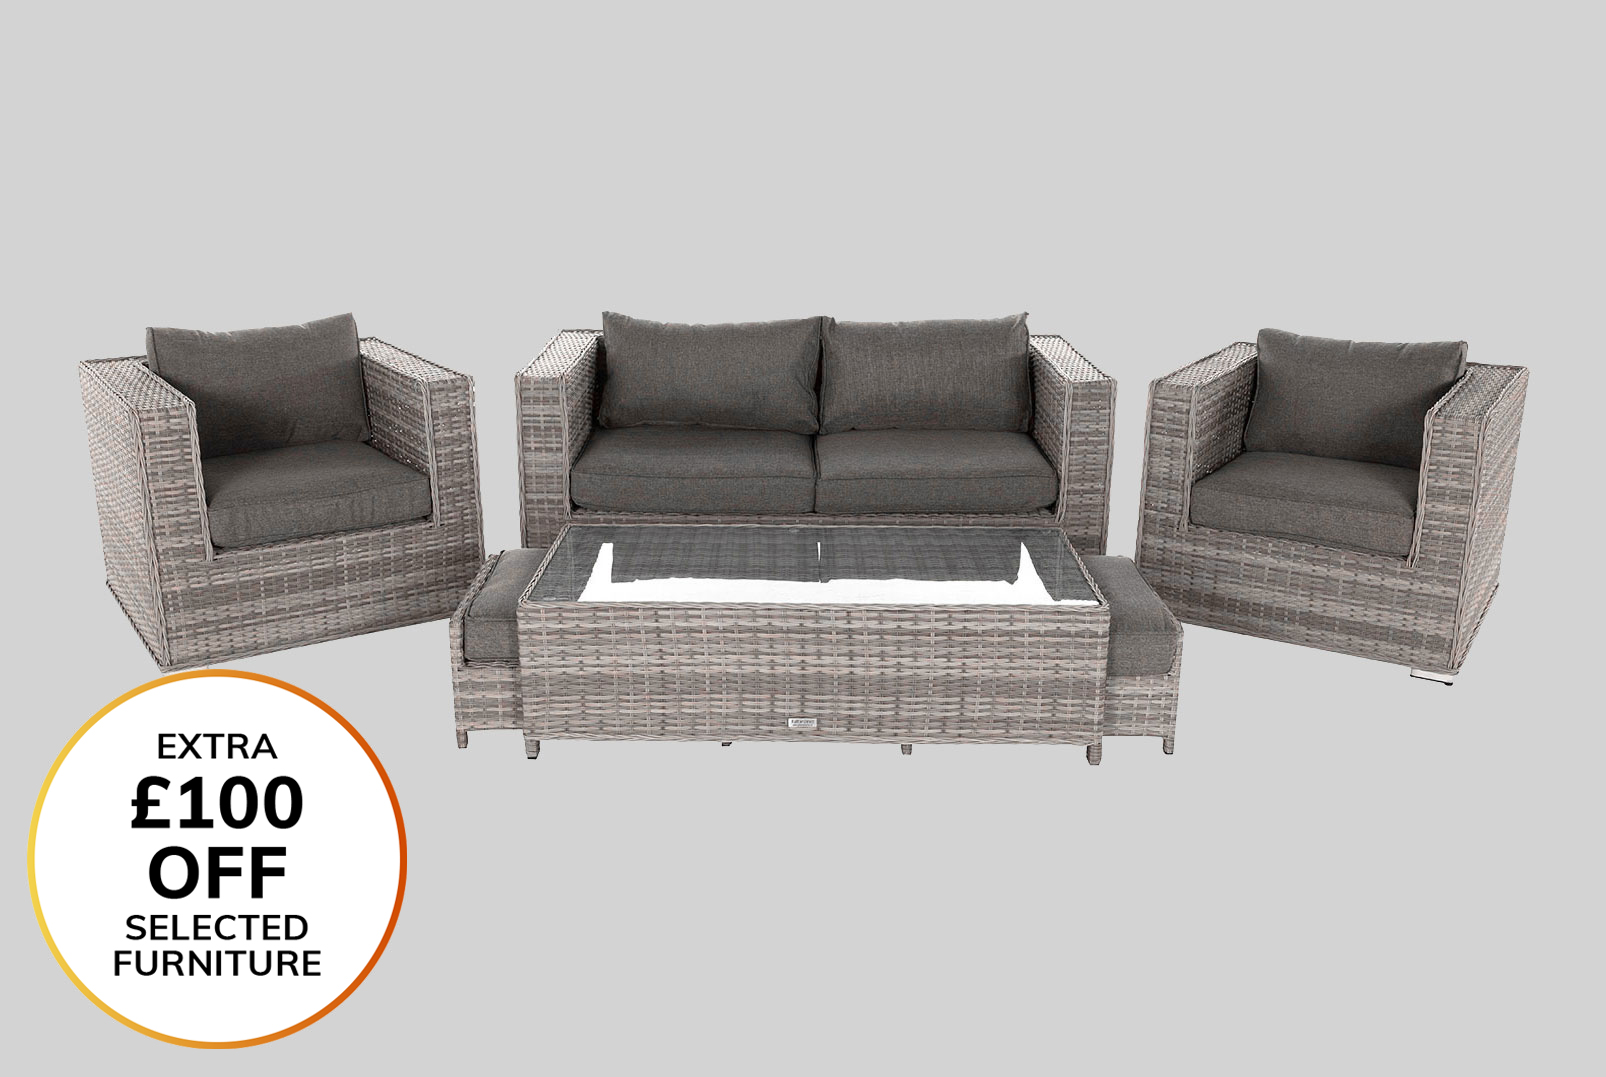 8f73647f9841 Rattan Garden Furniture Sets - Outdoor Patio Furniture ...